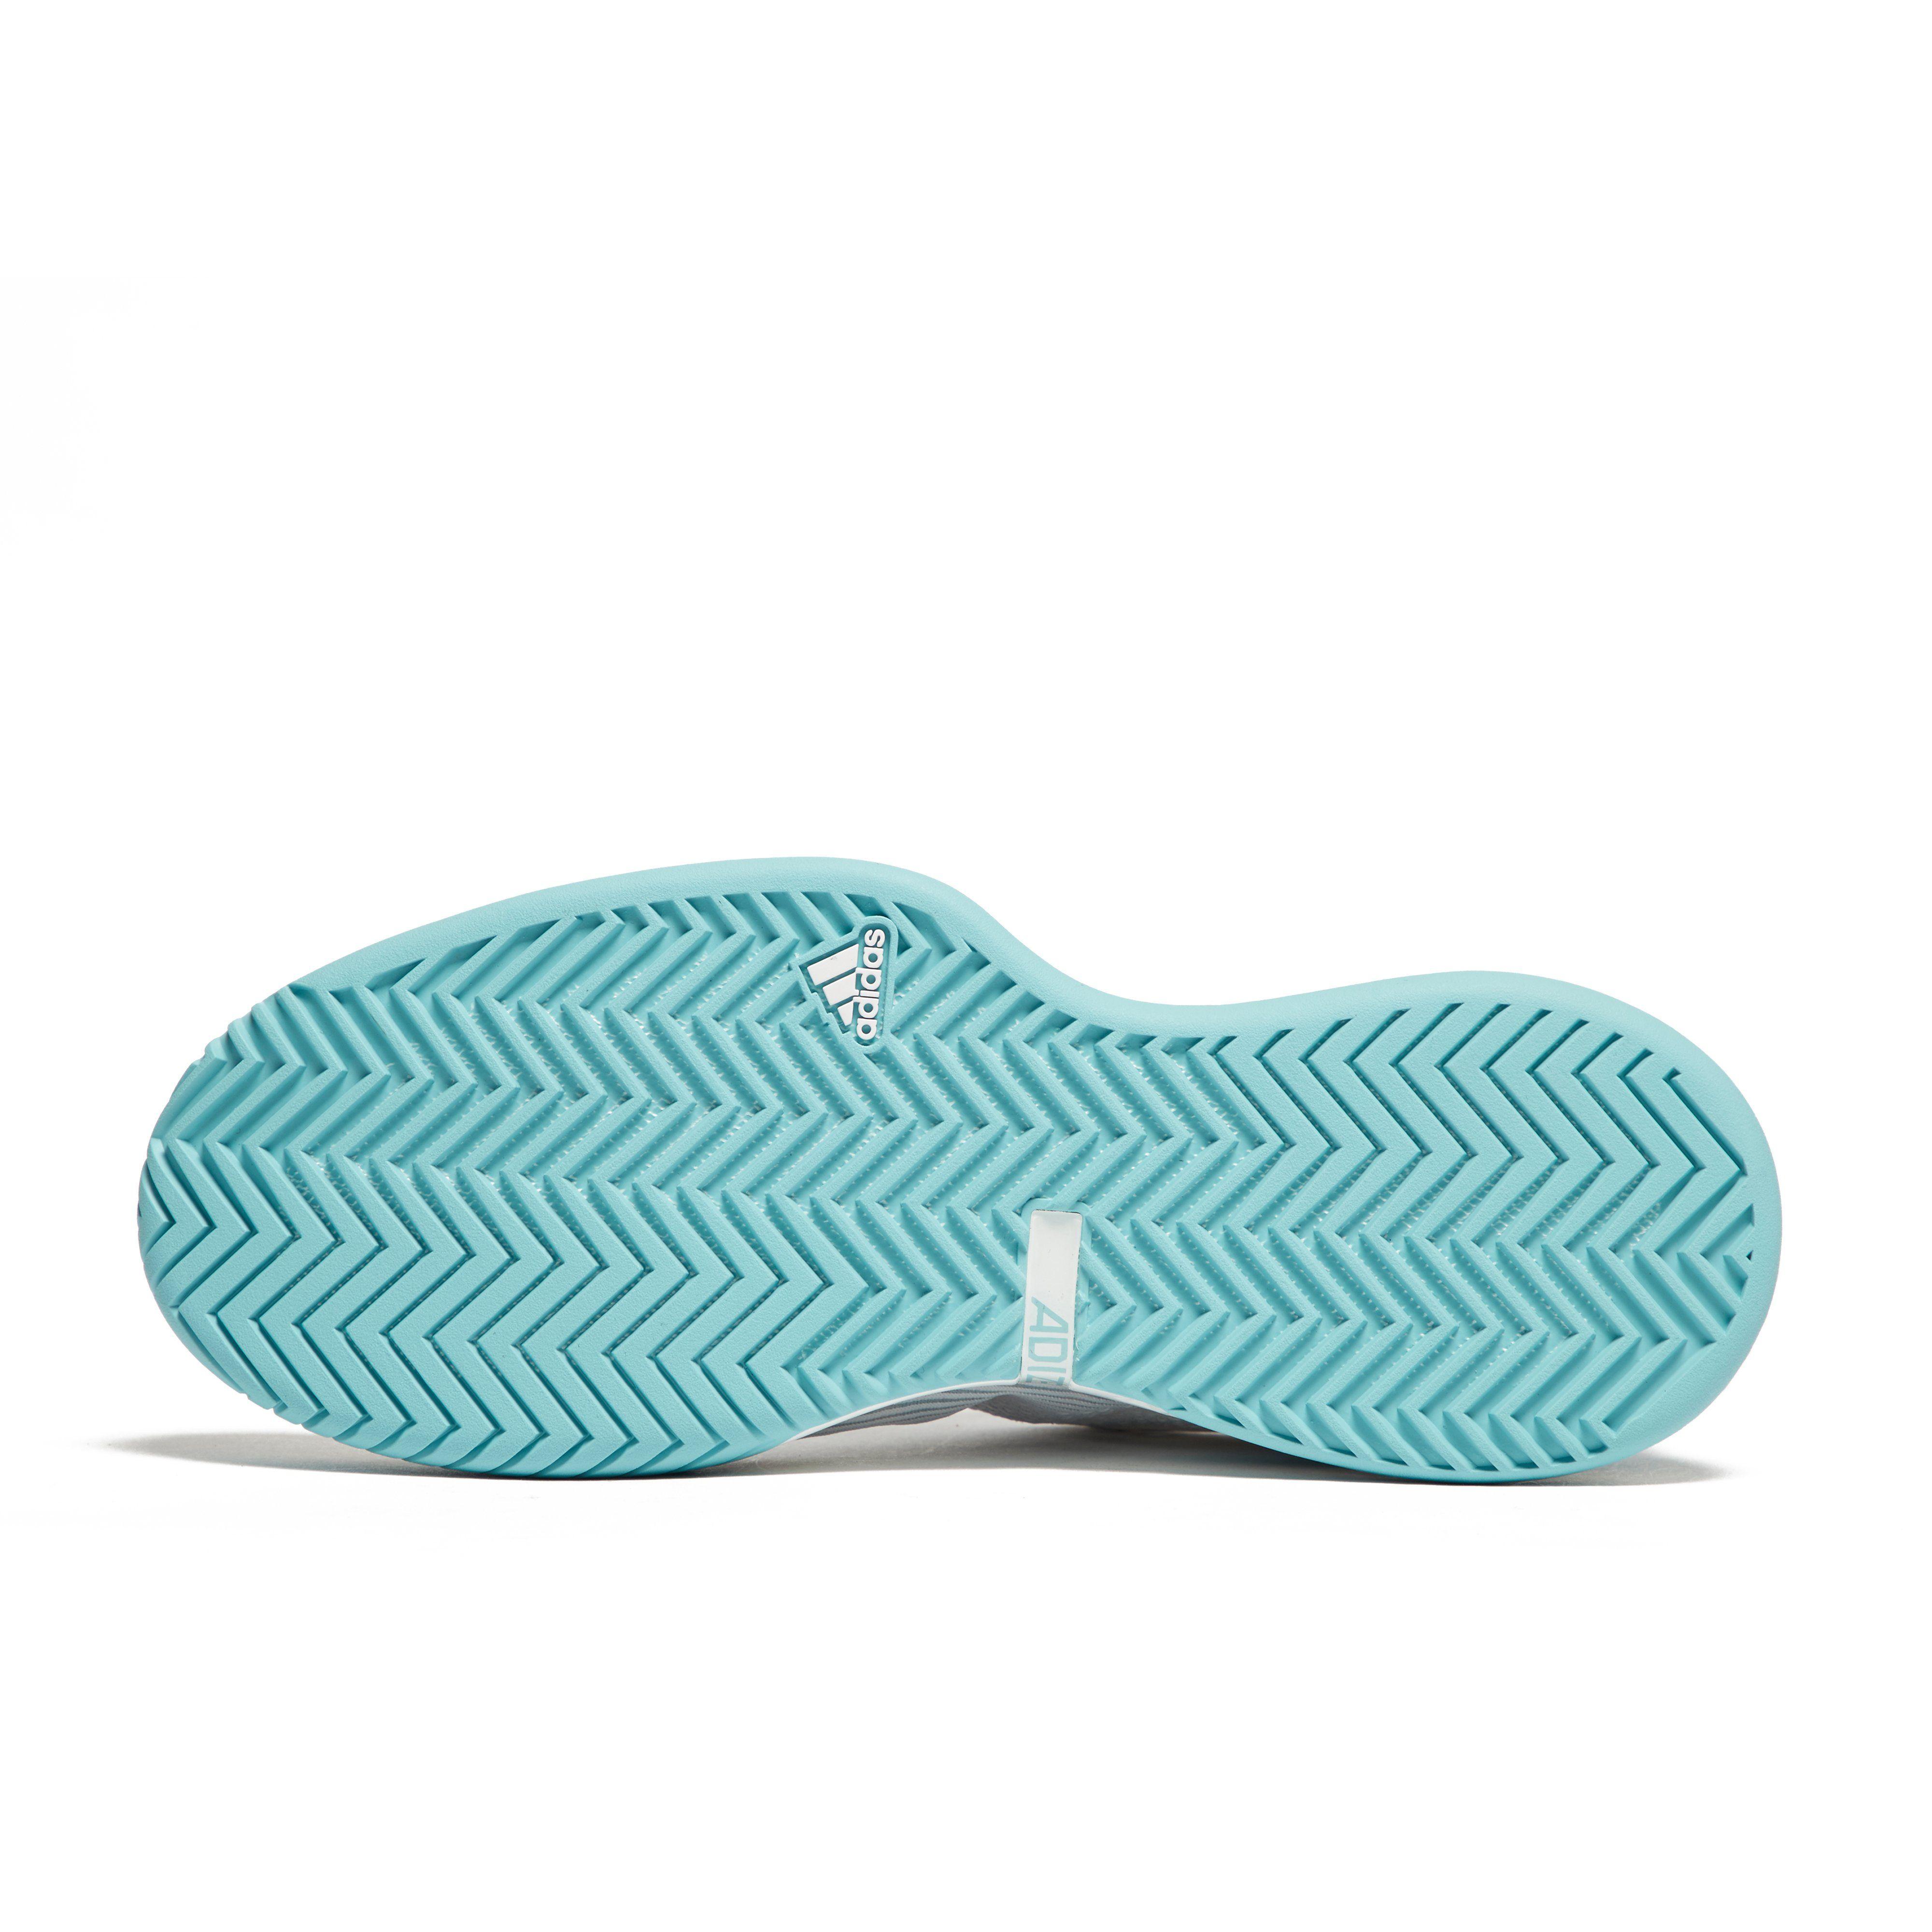 adidas Adizero Ubersonic 3.0 Men's Tennis Shoes